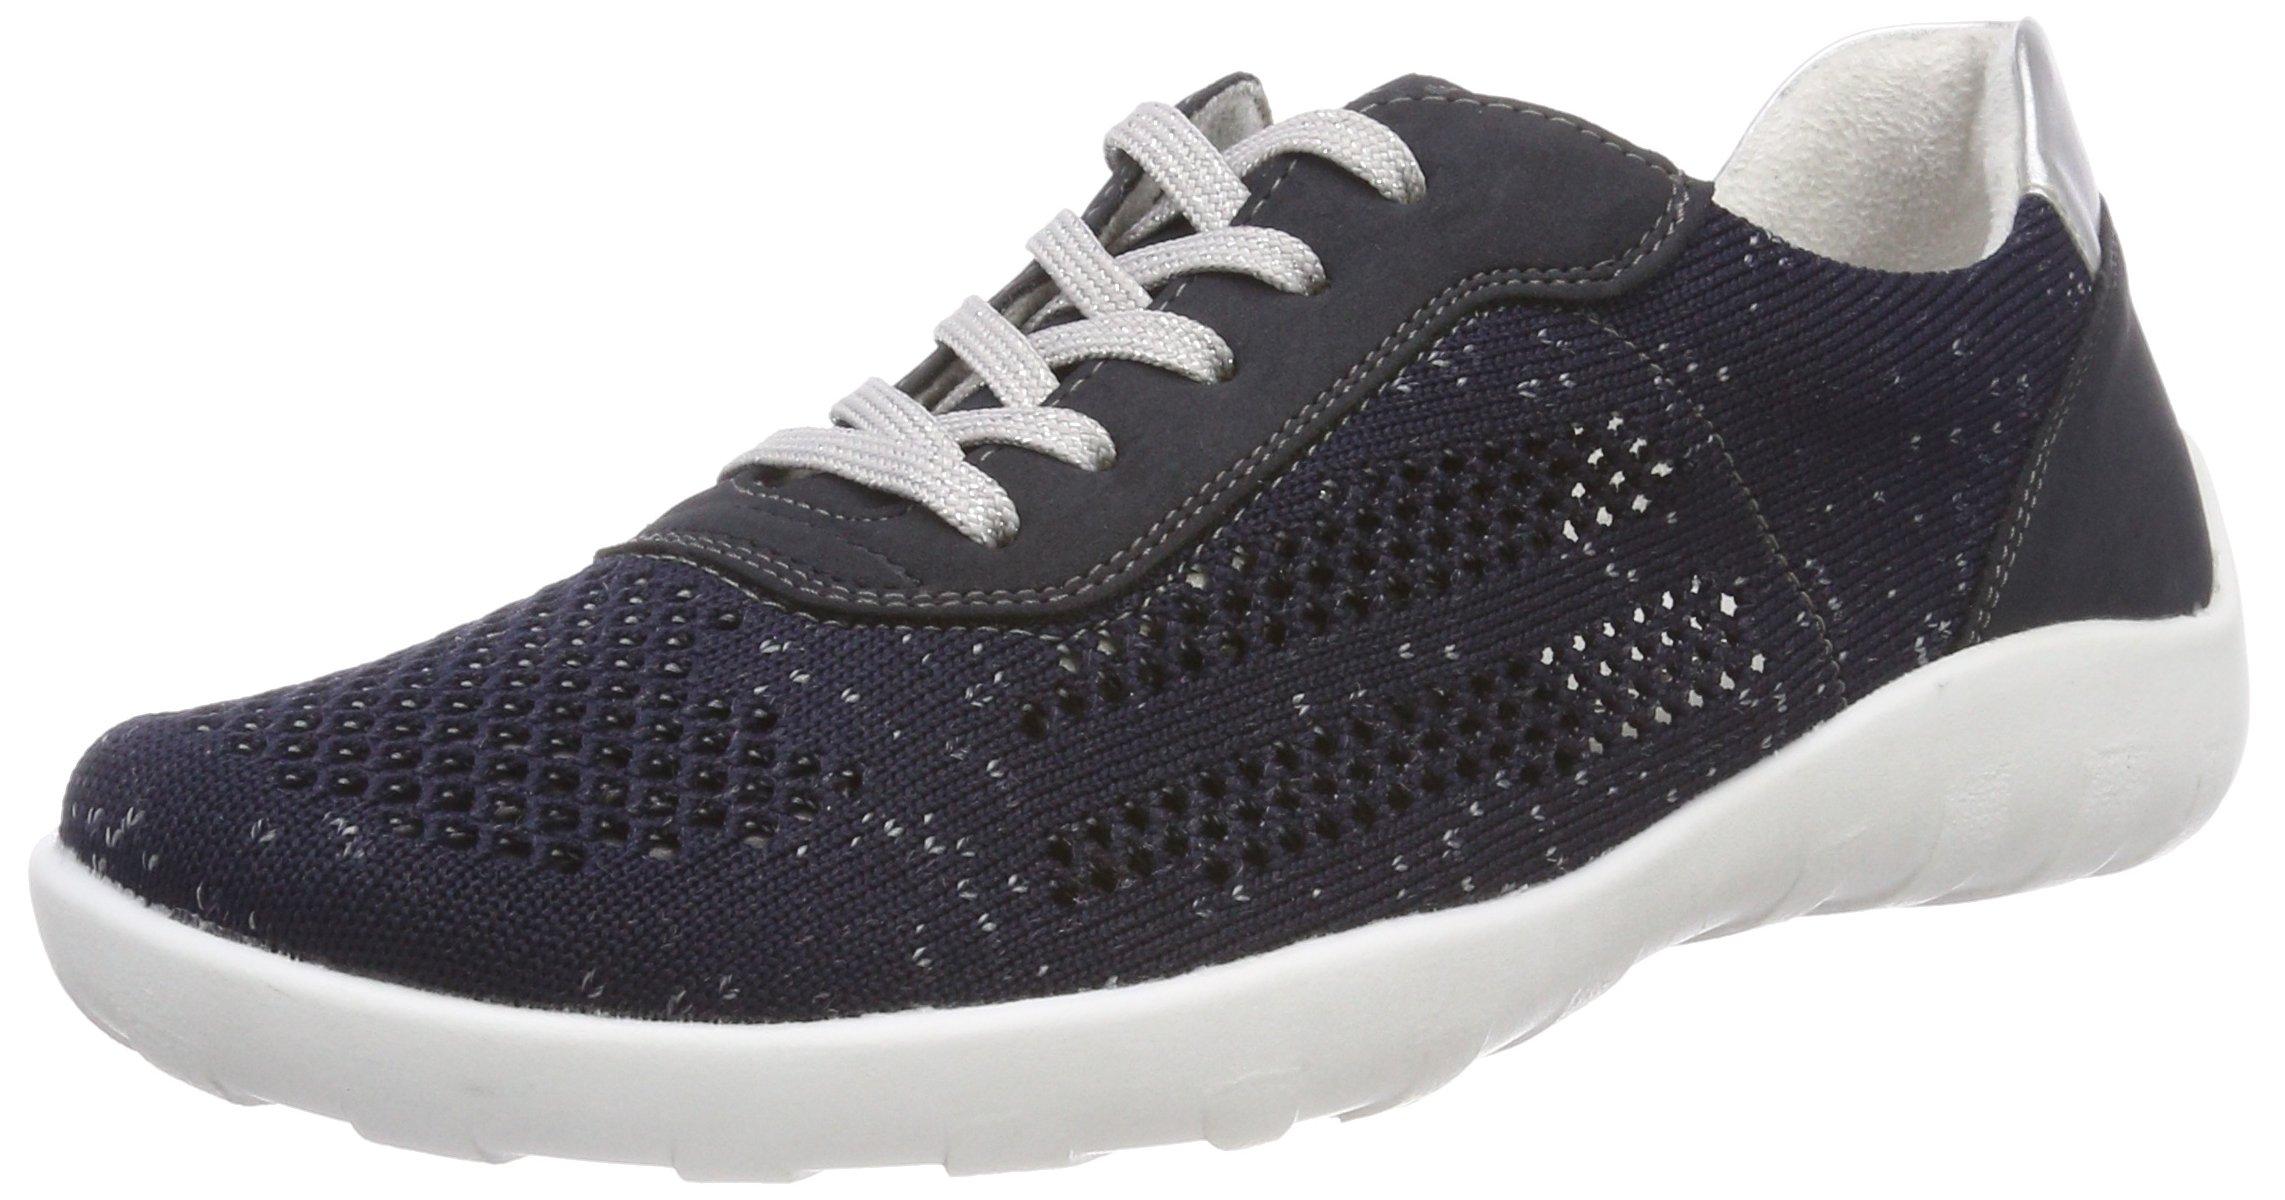 R3503Sneakers Eu Basses silver39 Remonte Pazifik FemmeBleu CBWxedQro